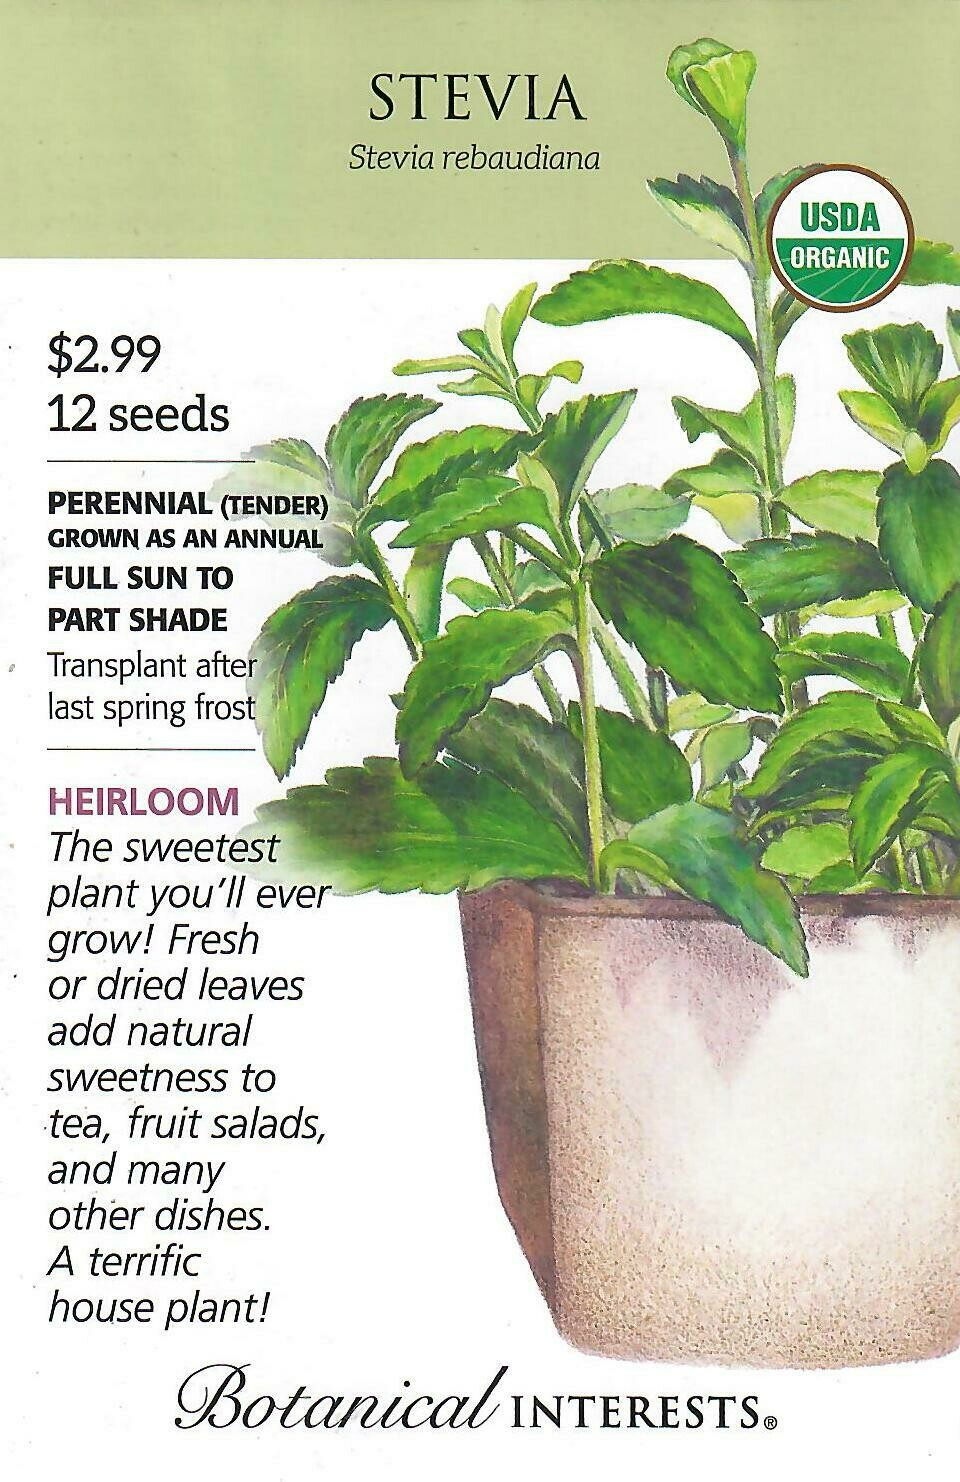 Stevia Candy Org Botanical Interests